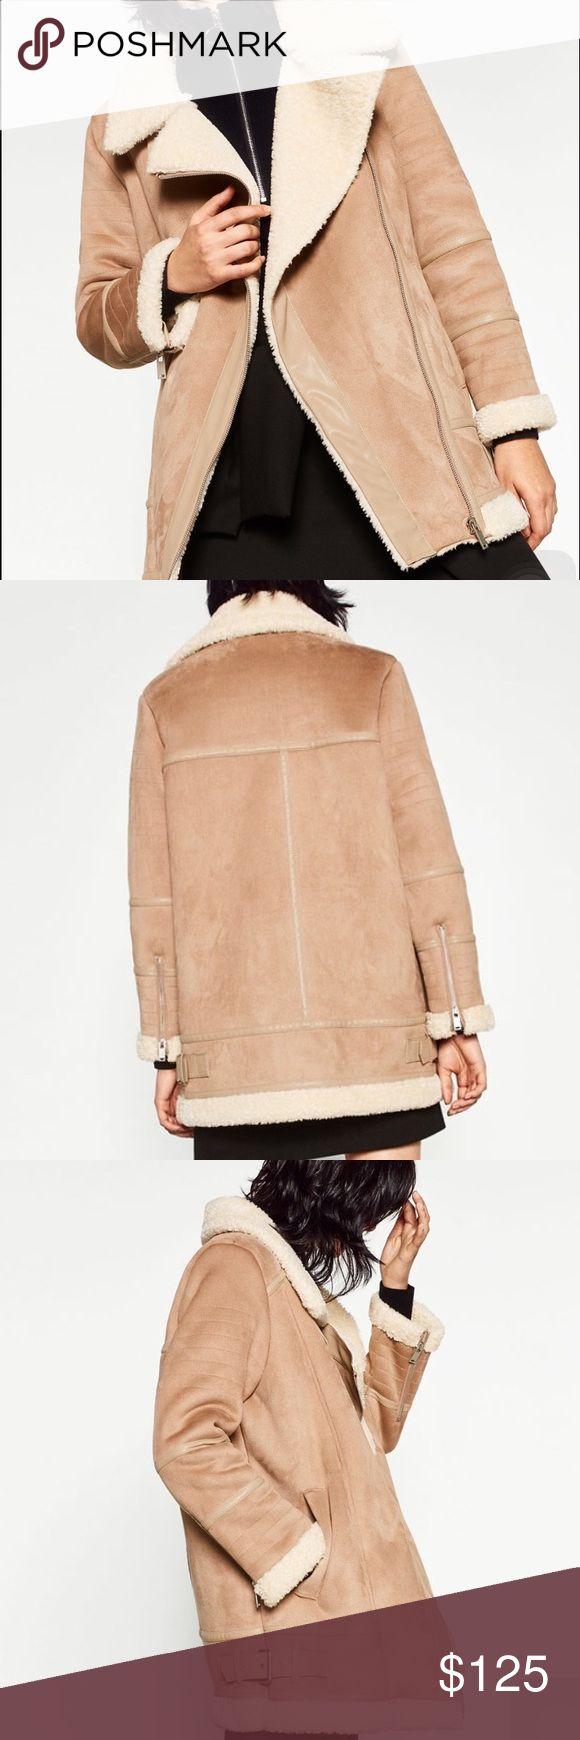 Zara oversized suede effect jacket Zara oversized suede effect jacket Zara Jackets & Coats